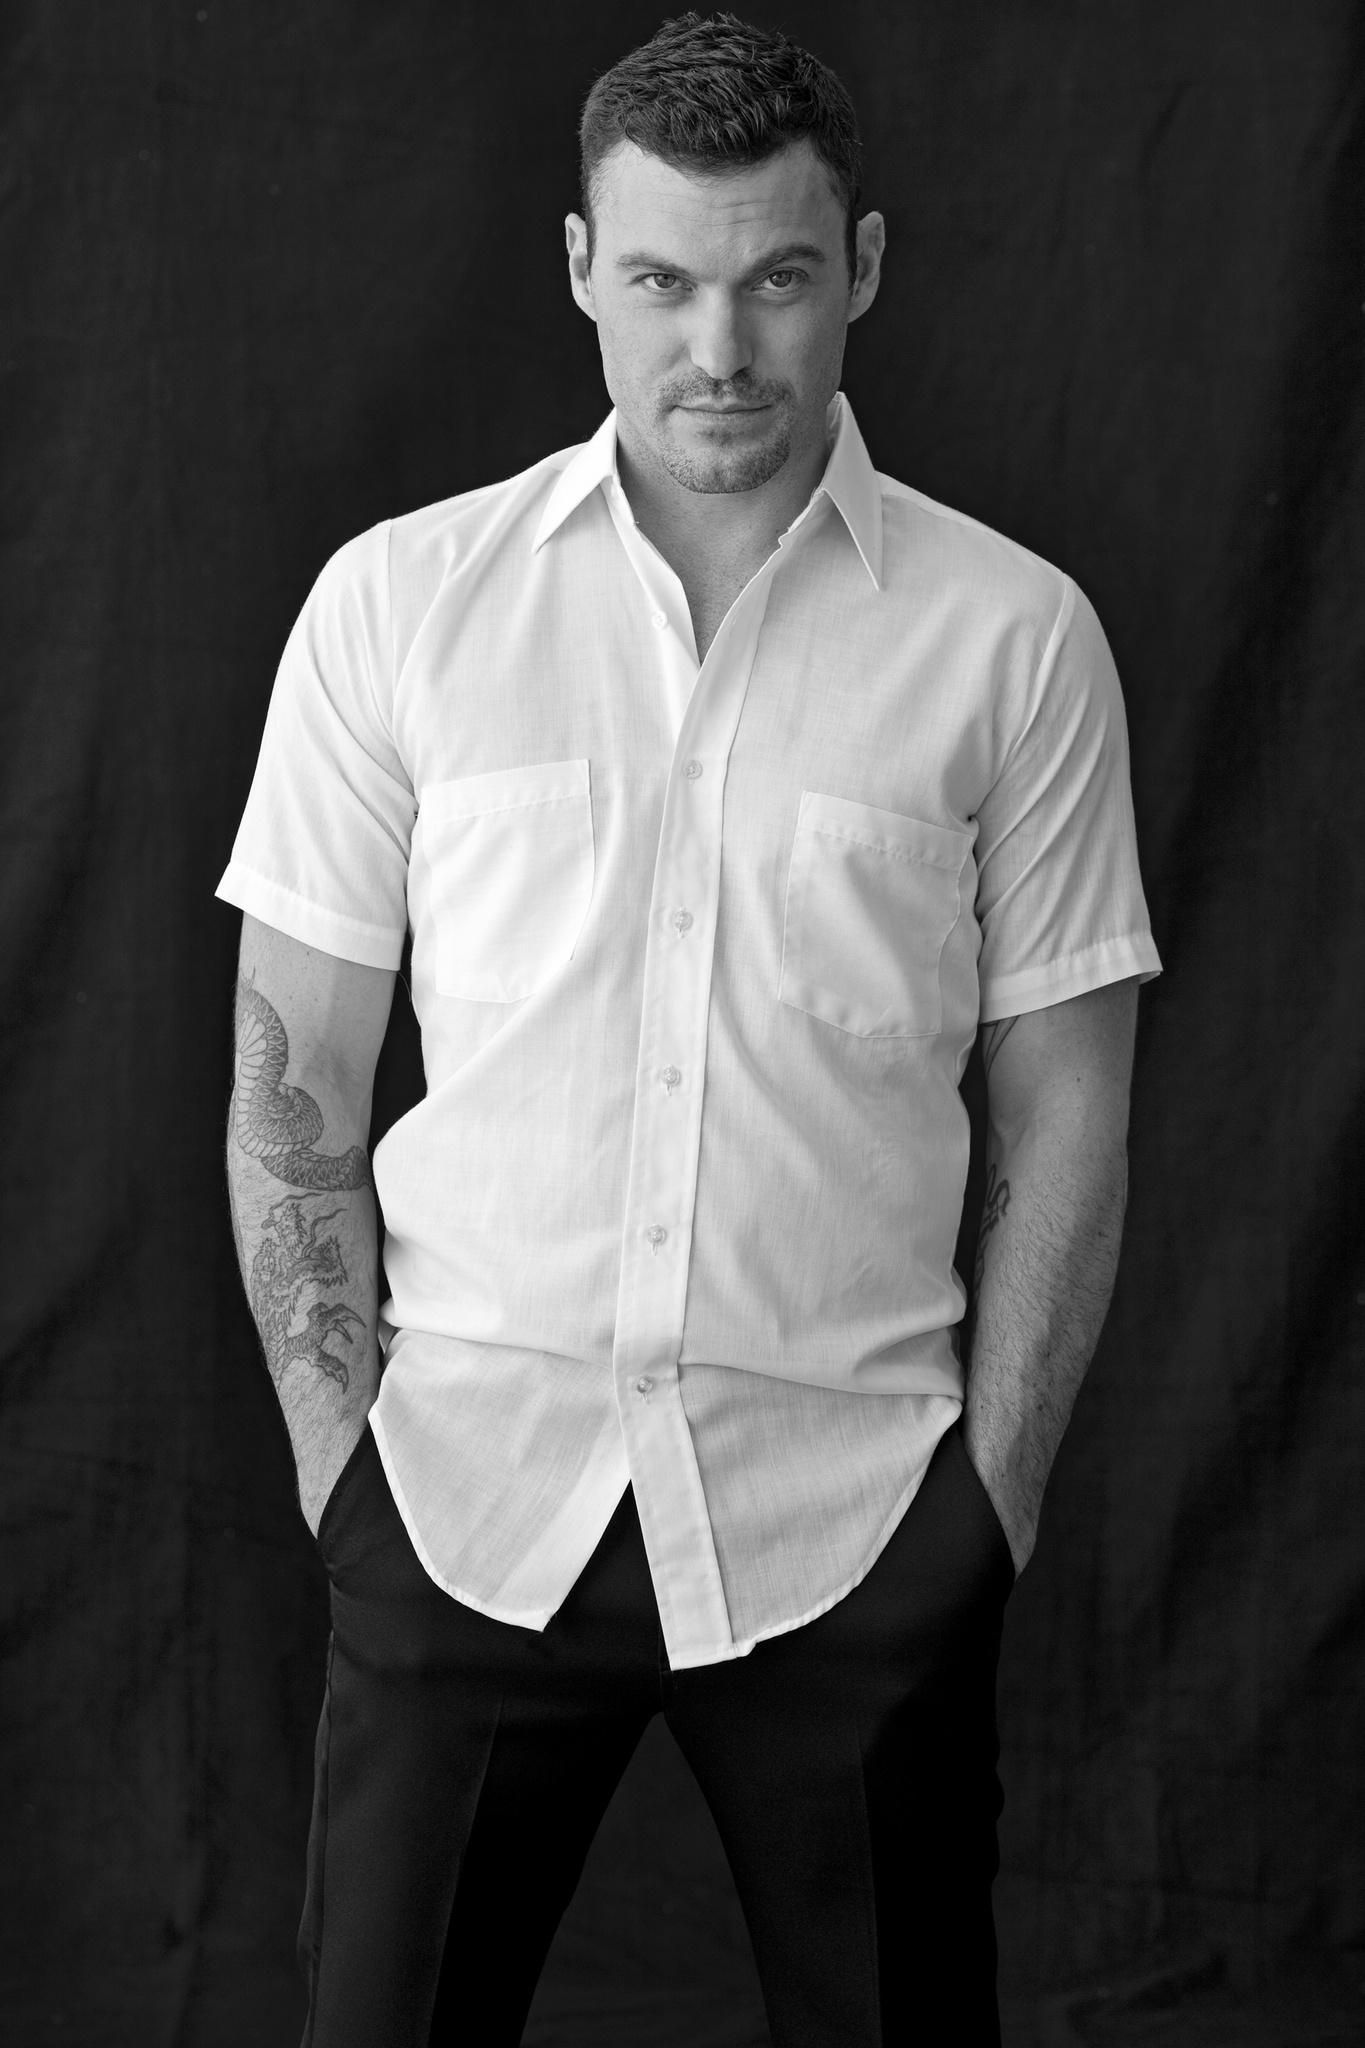 Brian Austin Green - IMDb